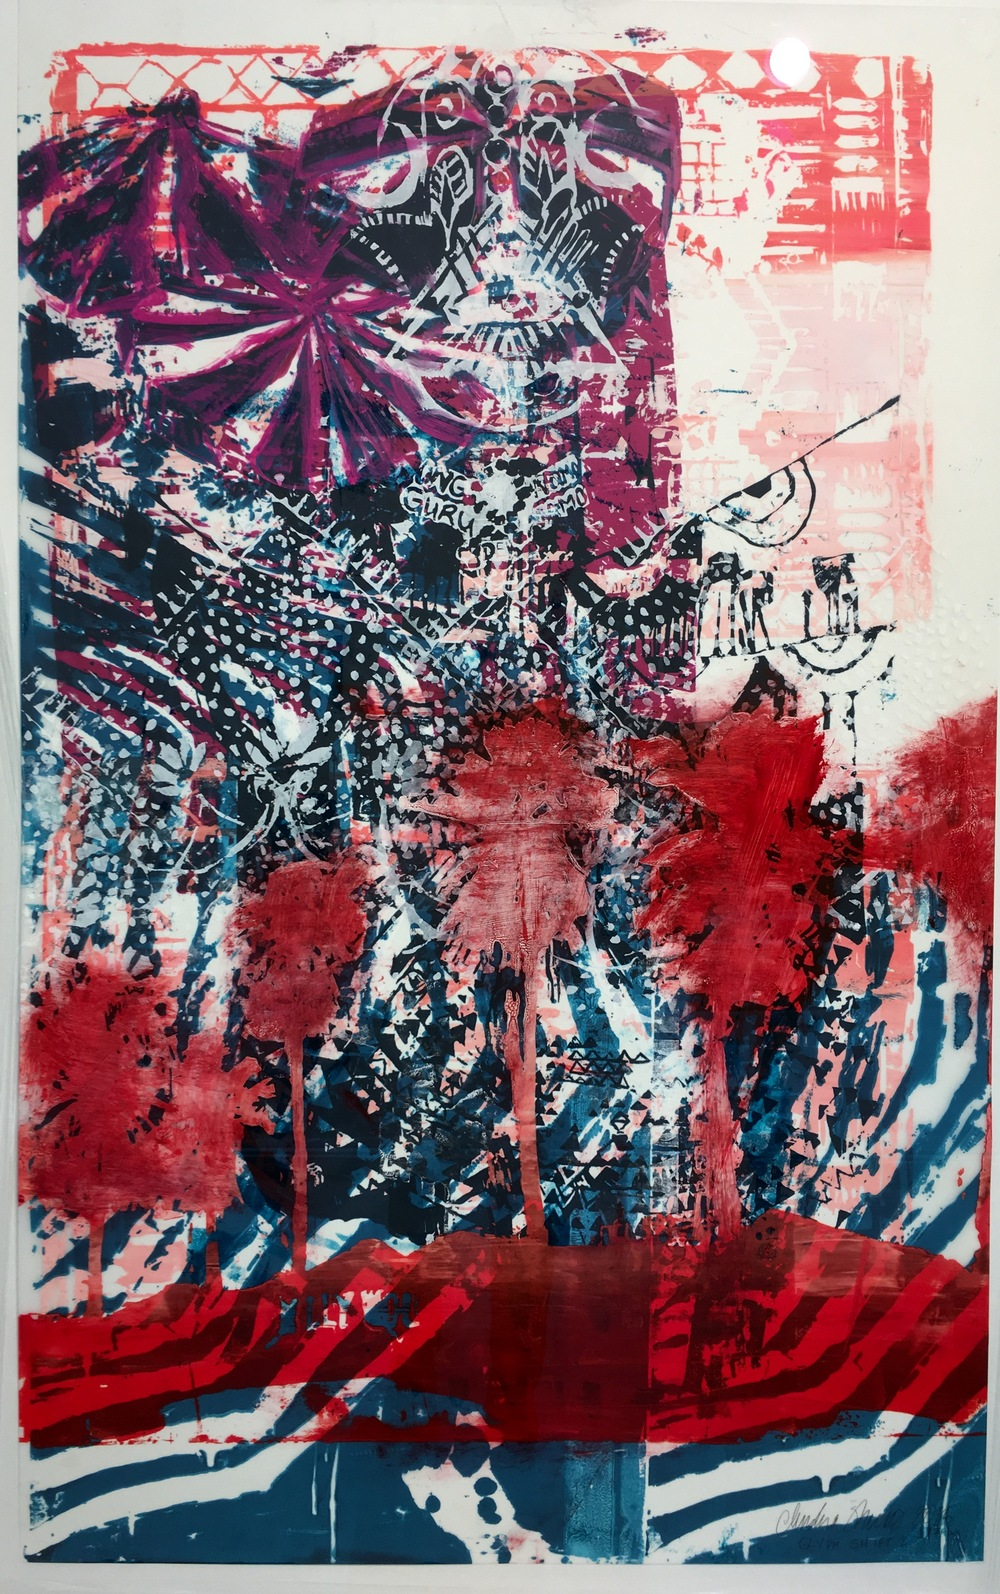 (SOLD) ''Glyph Shift'' 111 x 74 cm